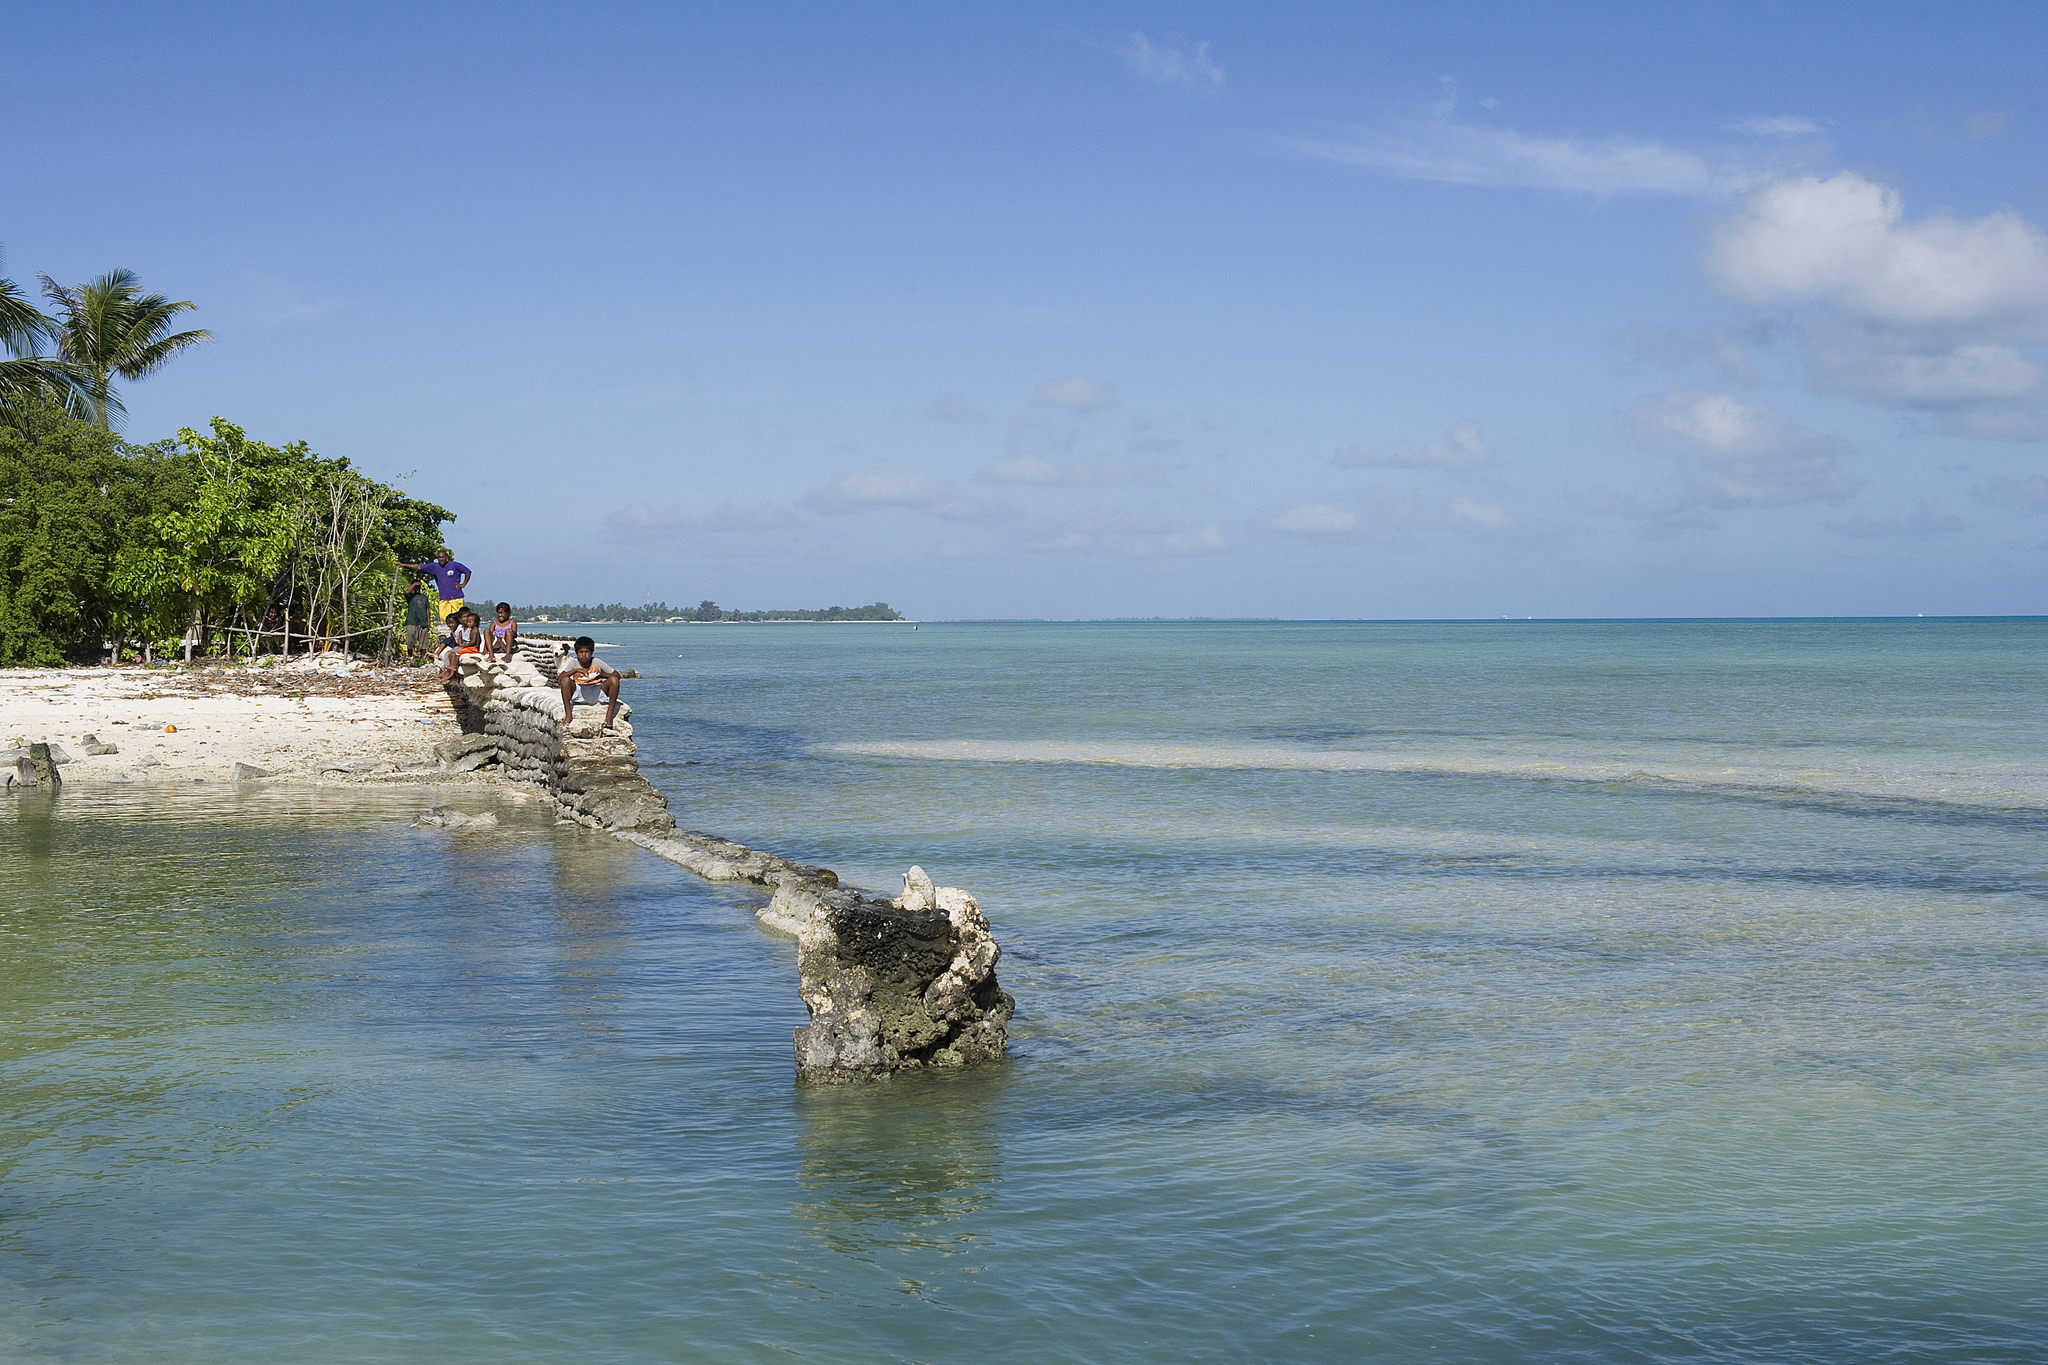 Filming the last generations of Kiribati